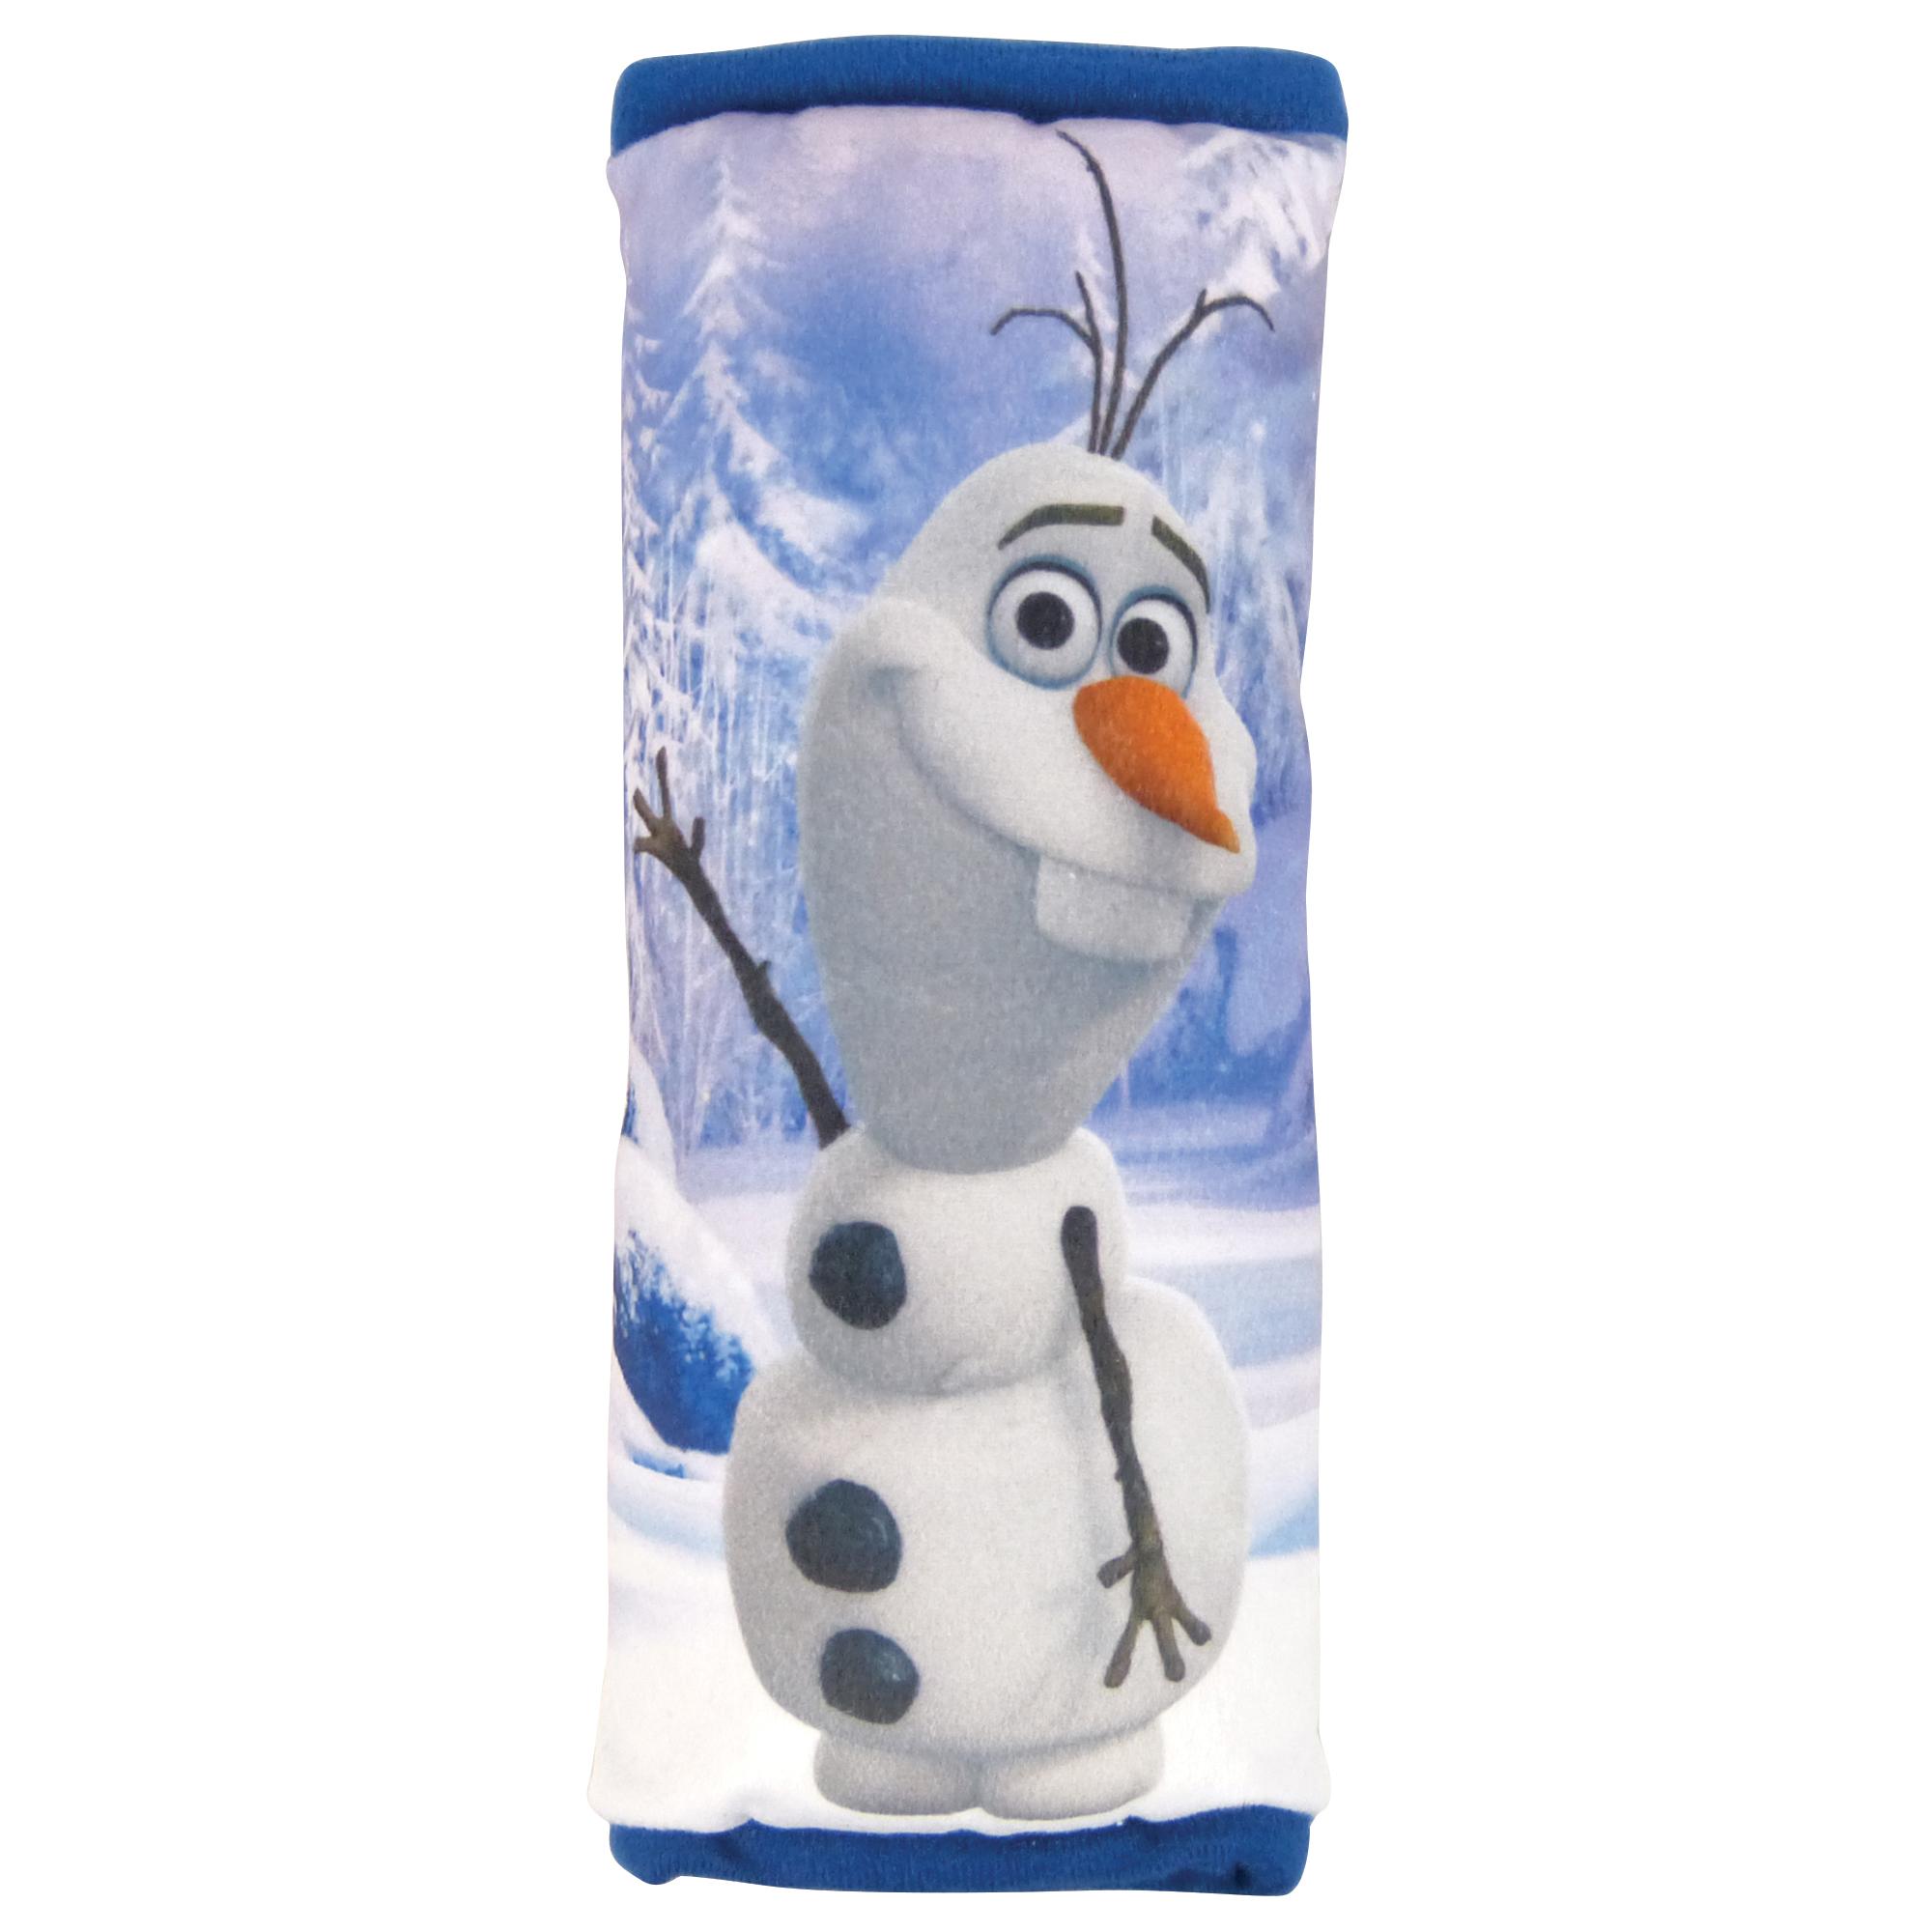 Gordelkussen Olaf